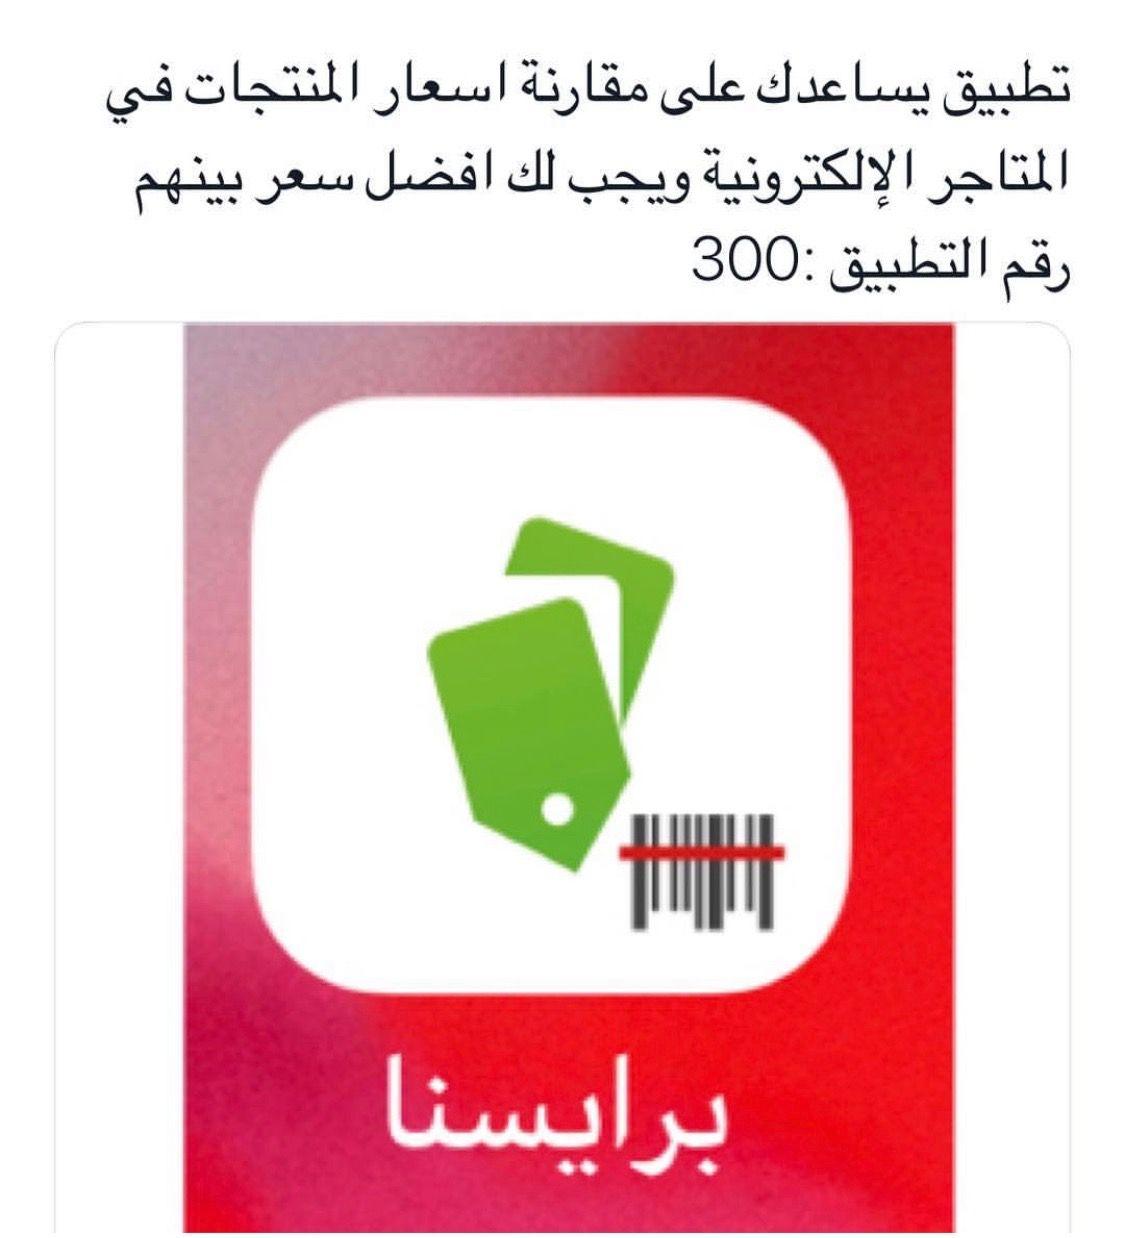 Pin By تبلد الس ـلطان On يرامج Iphone Apps App Gaming Logos